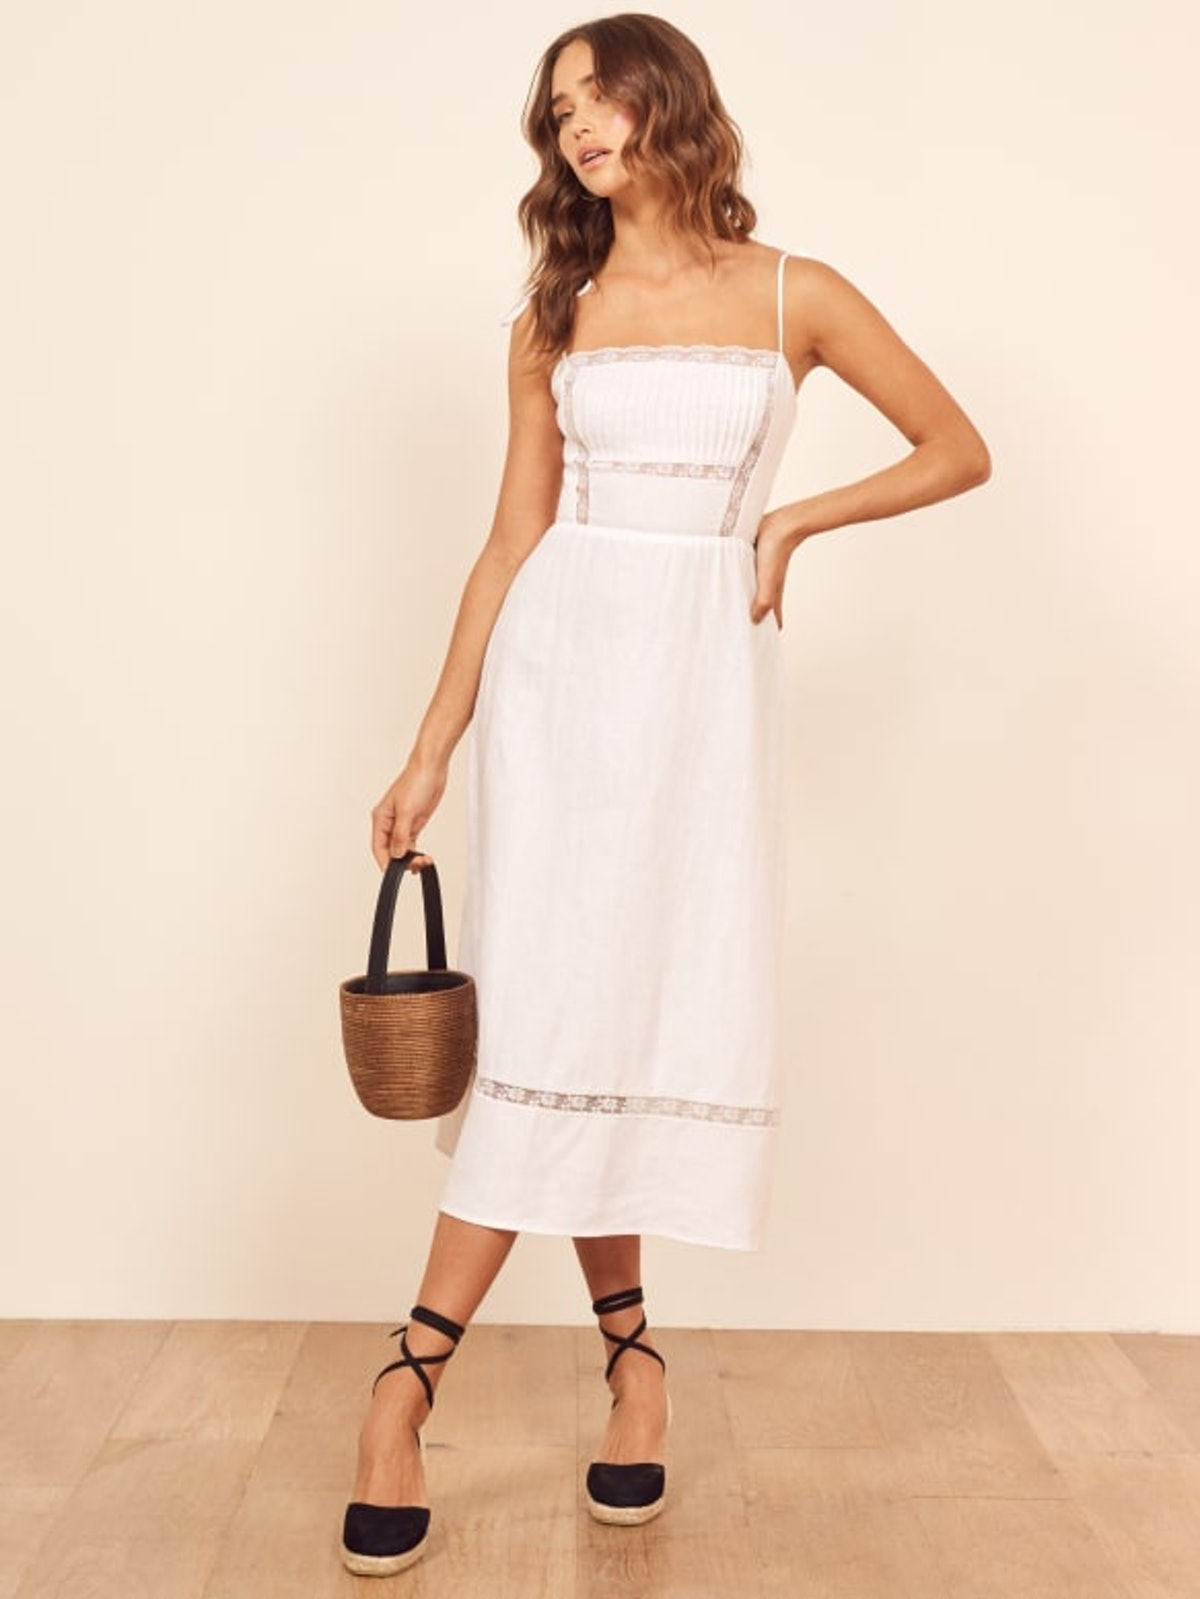 Wyoming Dress in White